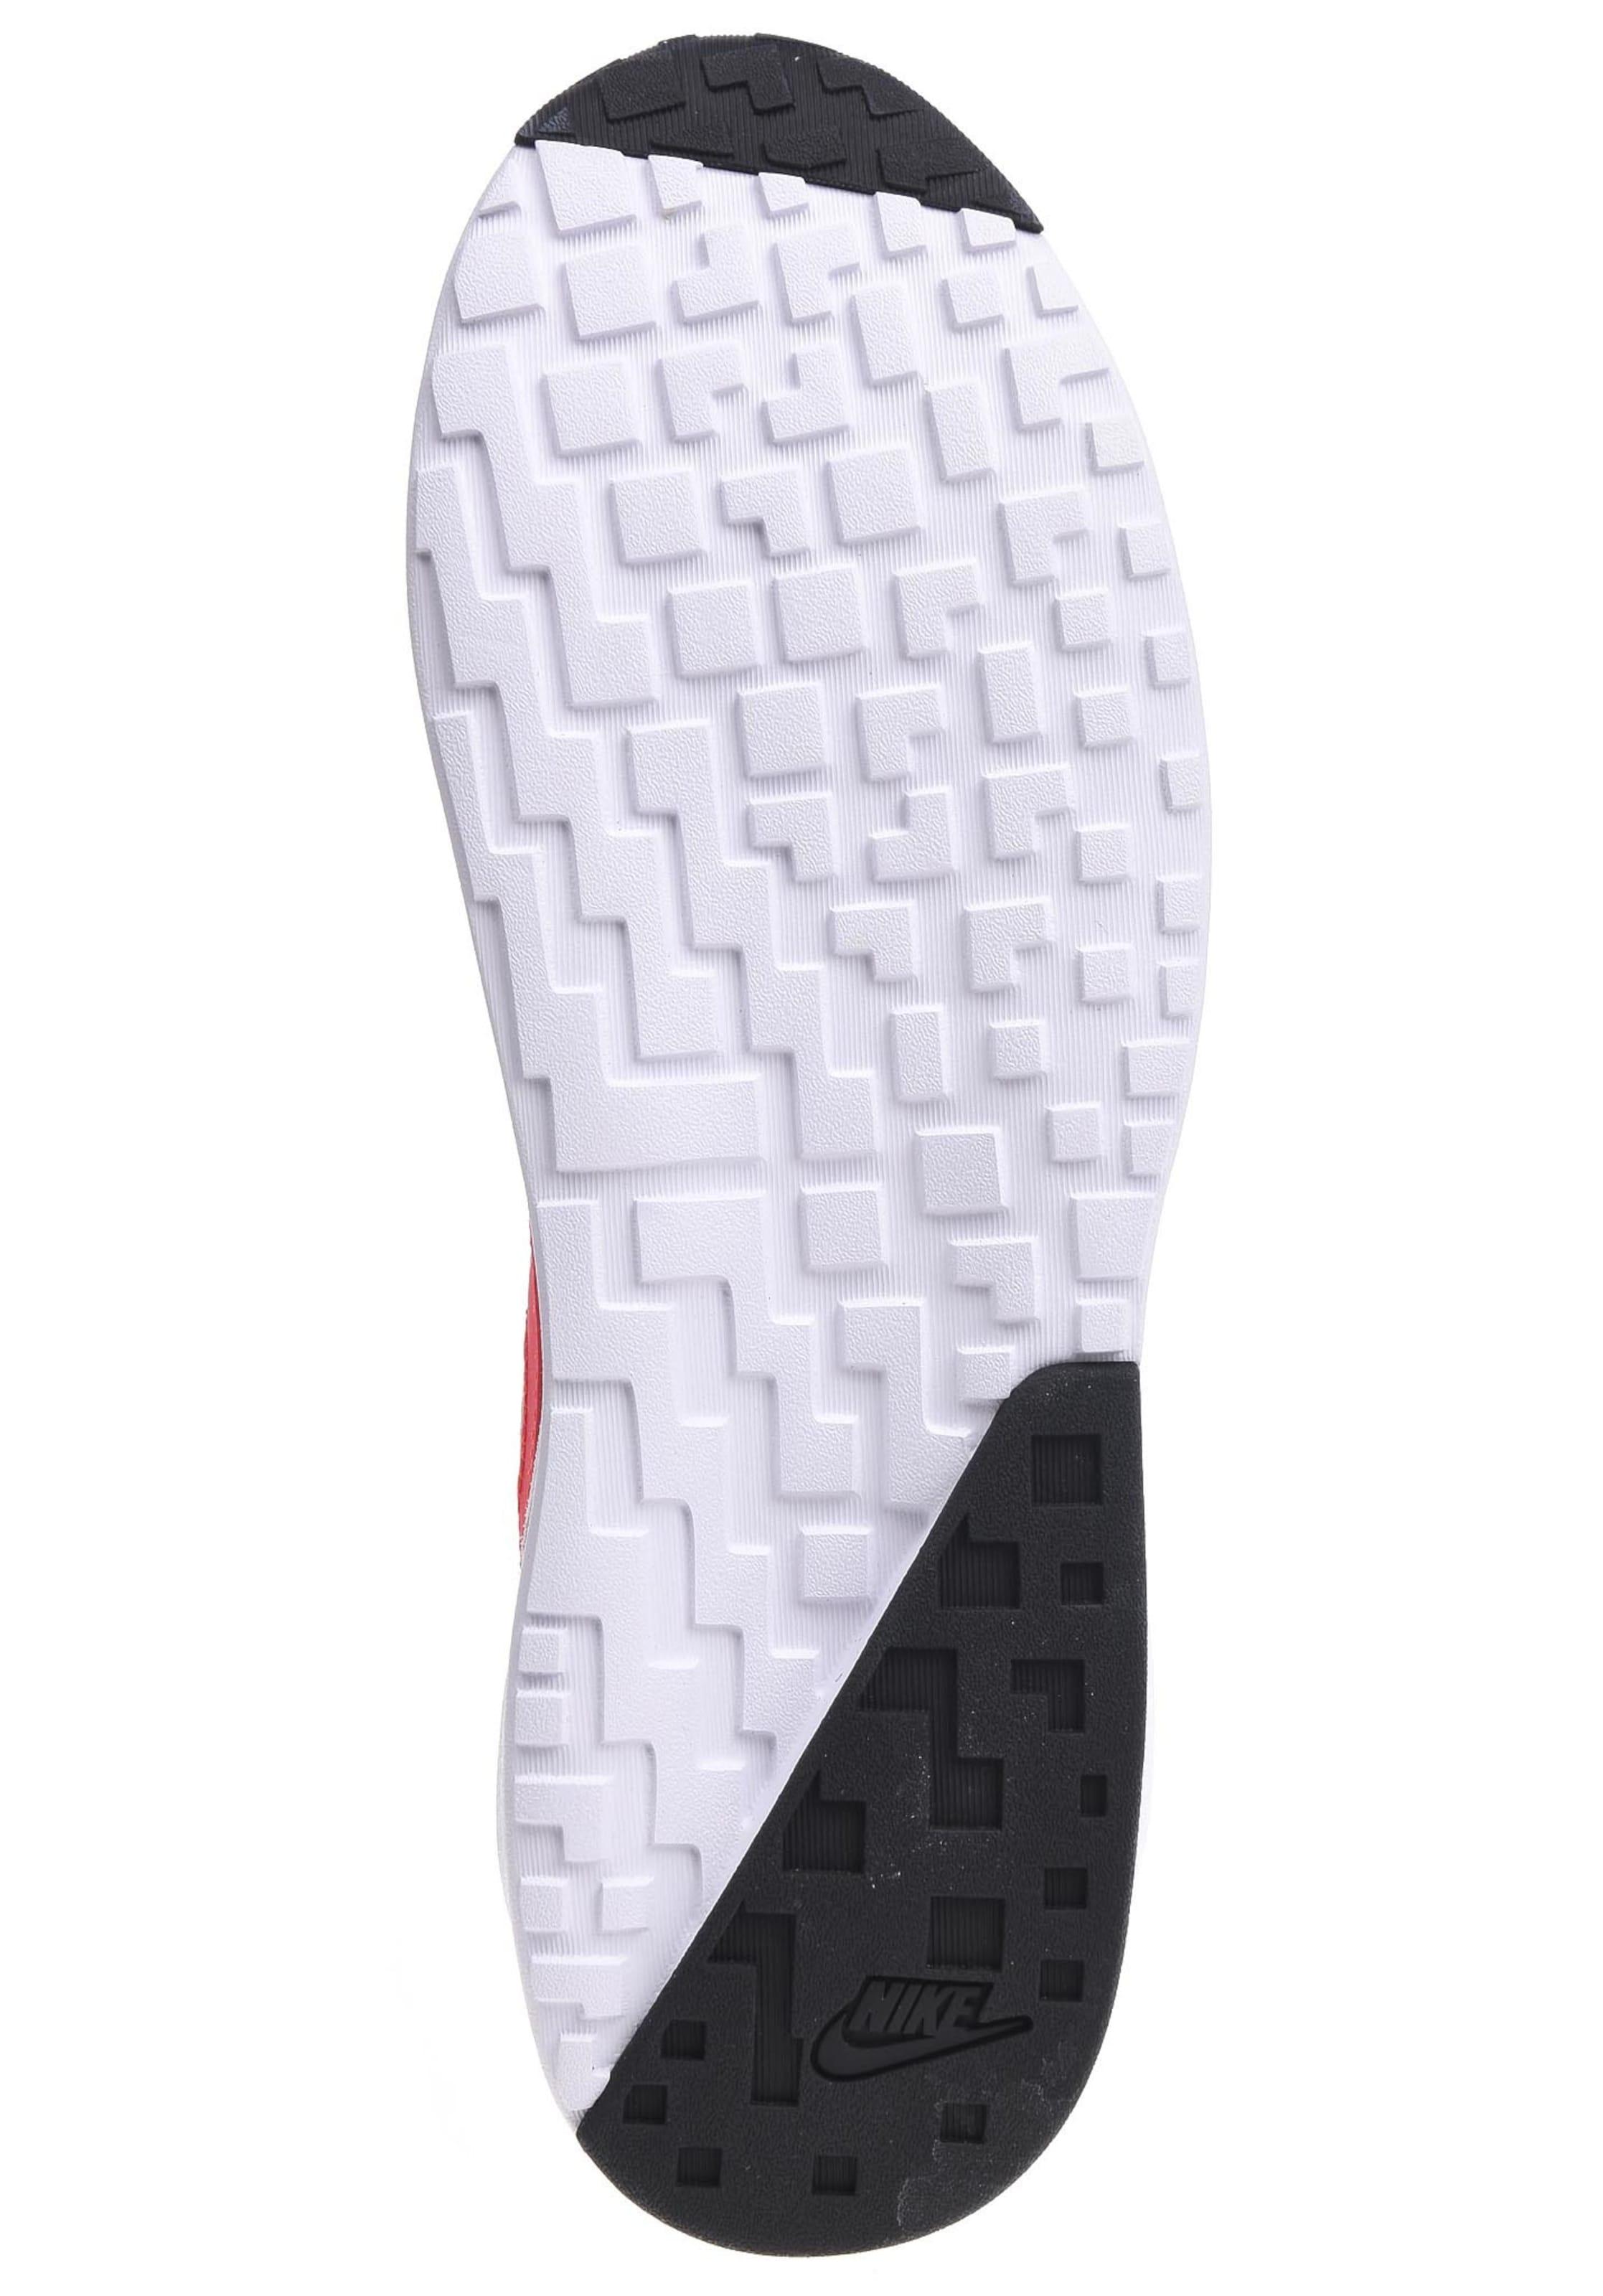 Nike Sportswear Turnschuhe 'Pantheos Textil, Leder Markenrabatt Markenrabatt Markenrabatt 84ad08